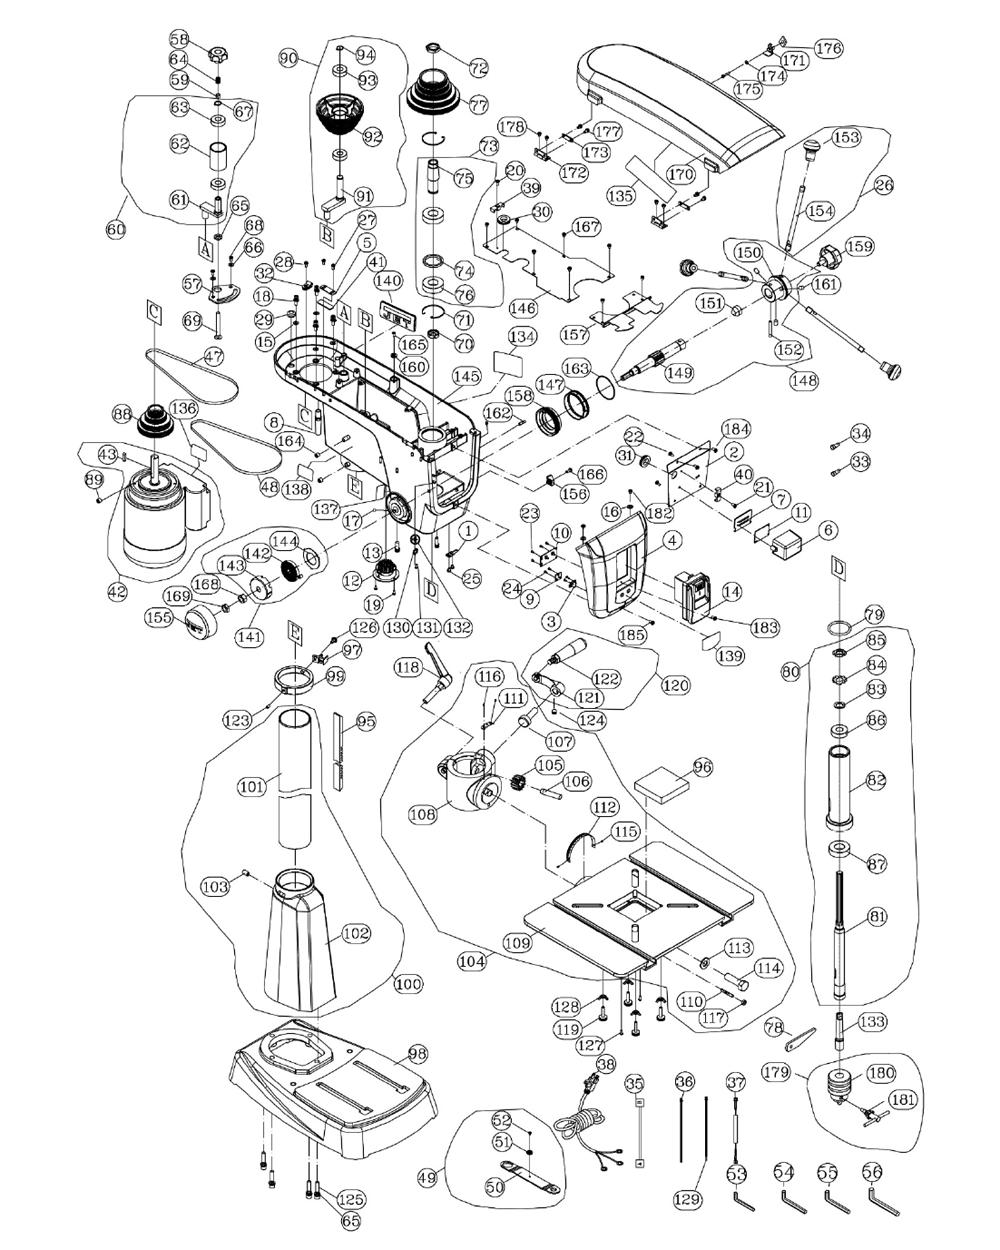 wilton drill press parts diagram